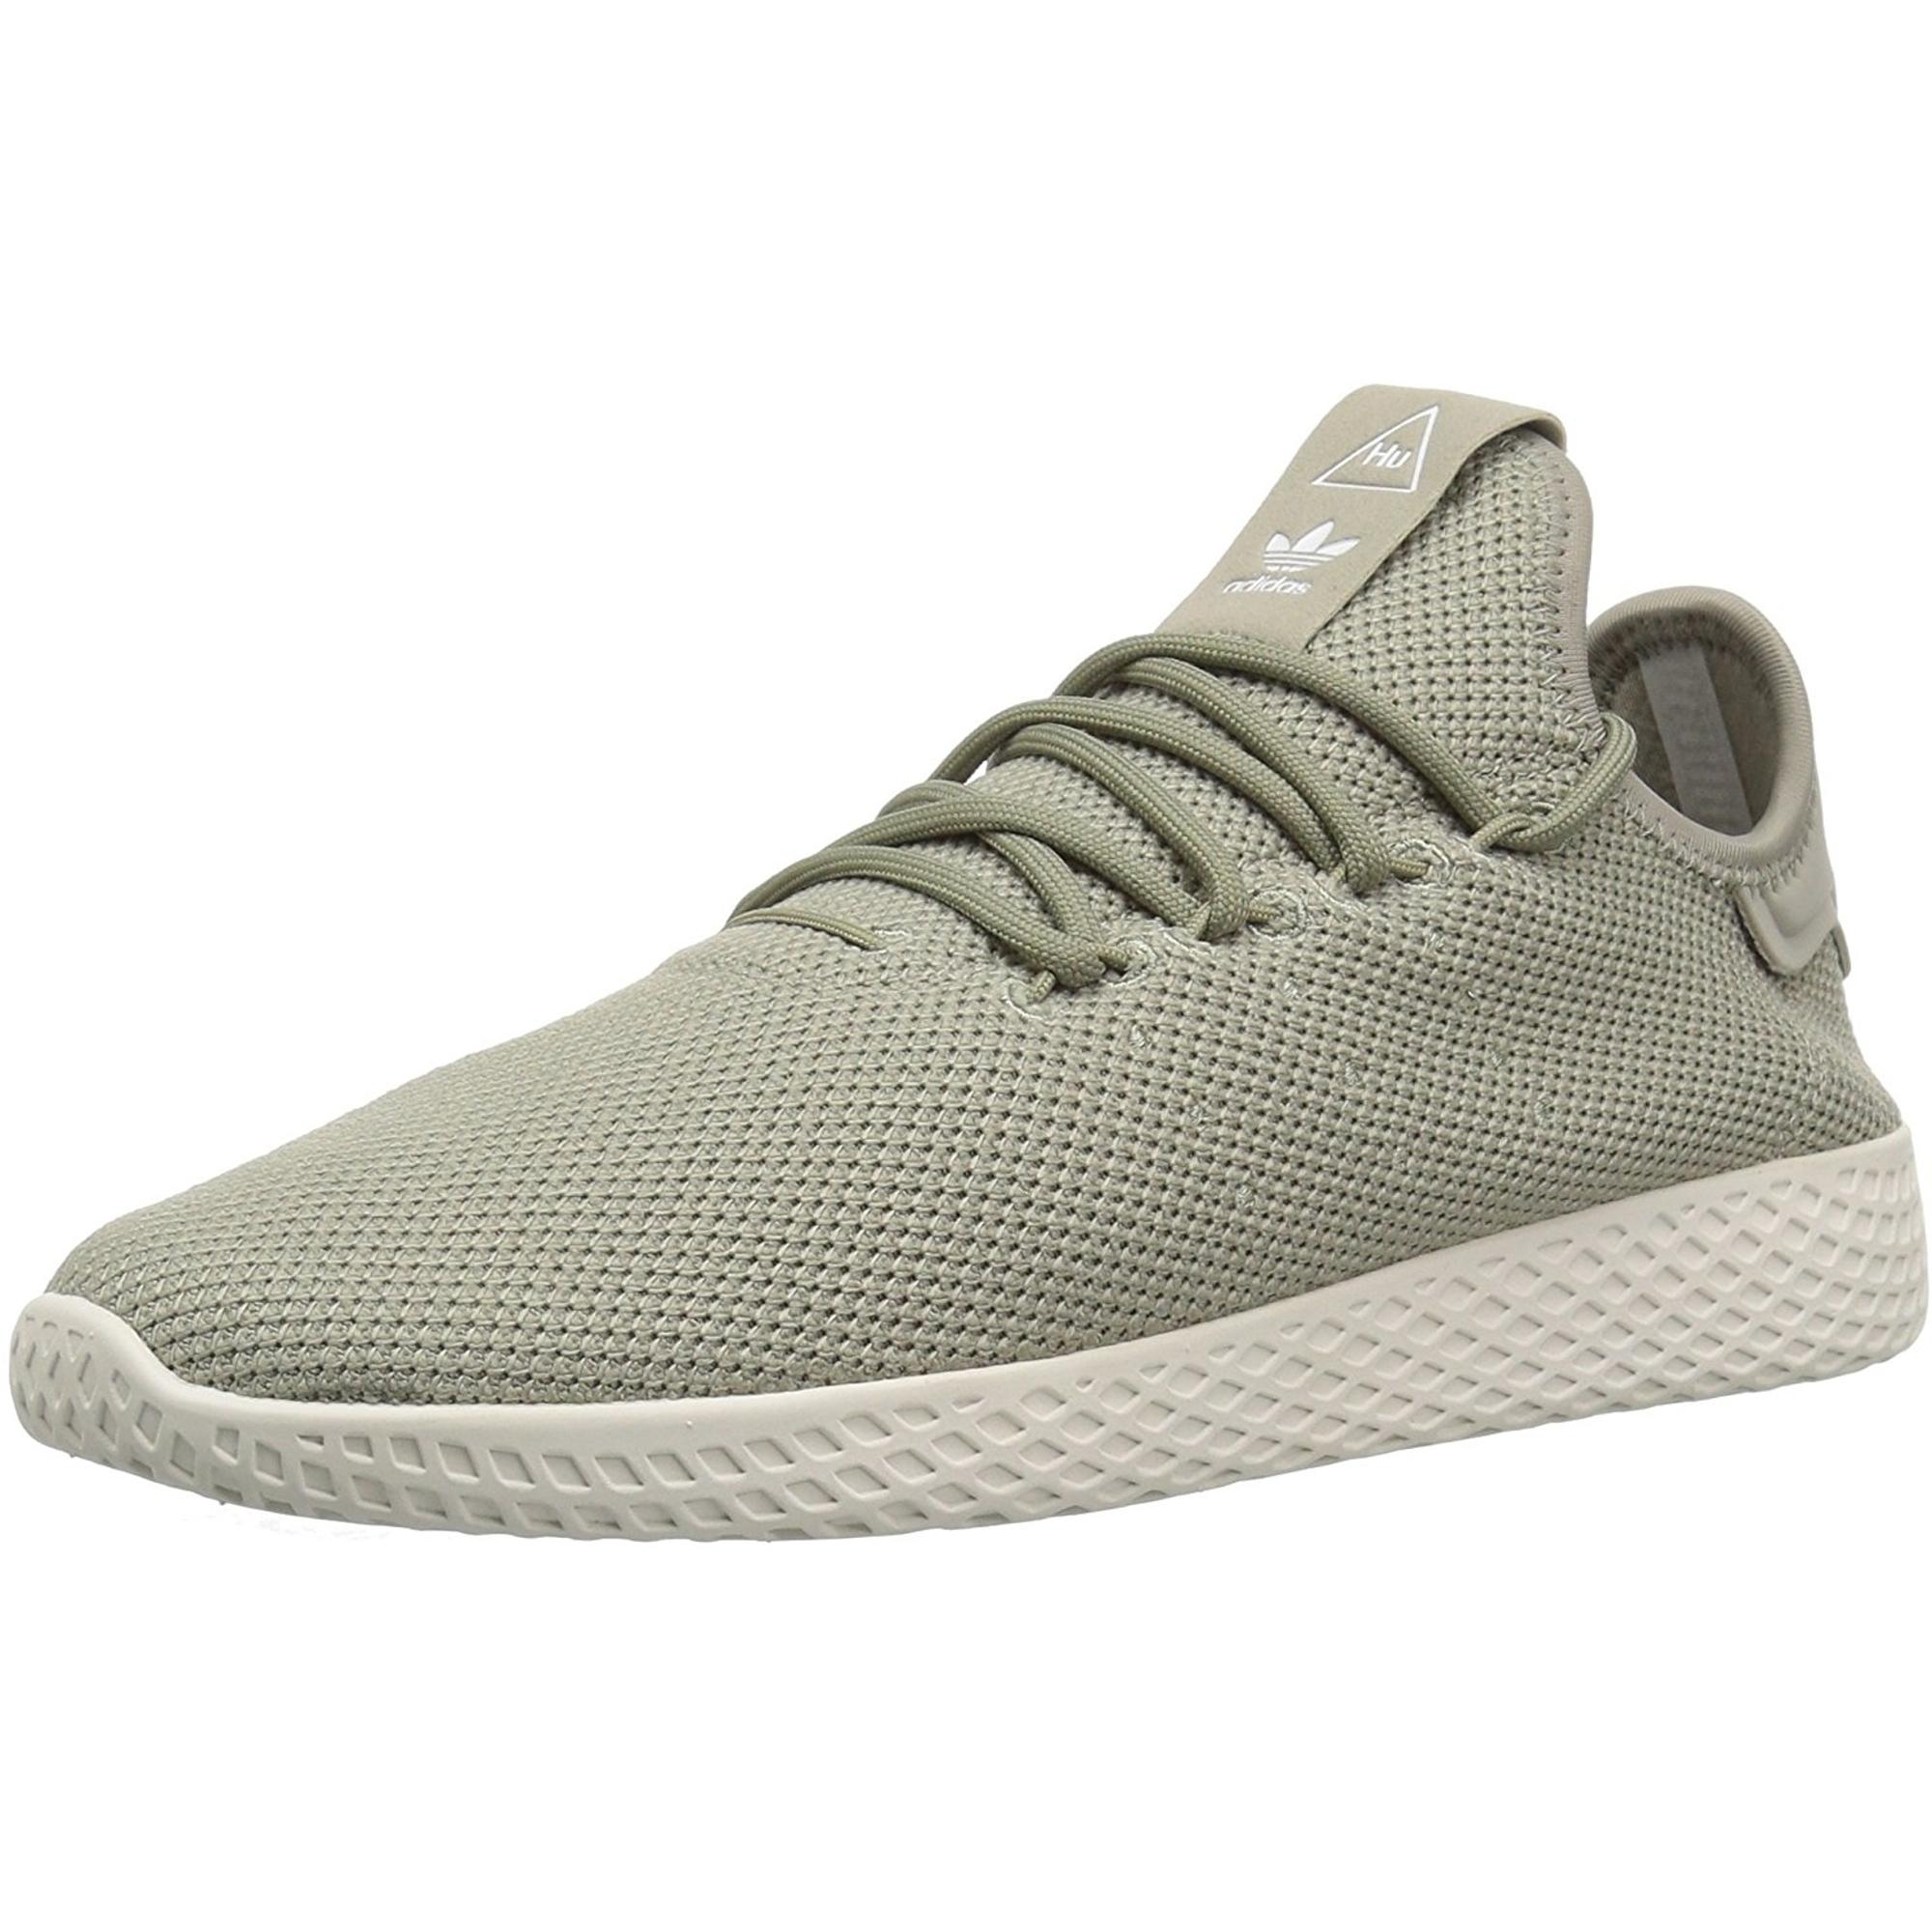 grey adidas hu adidas hu formateurs formateurs grey SMVpUzqG